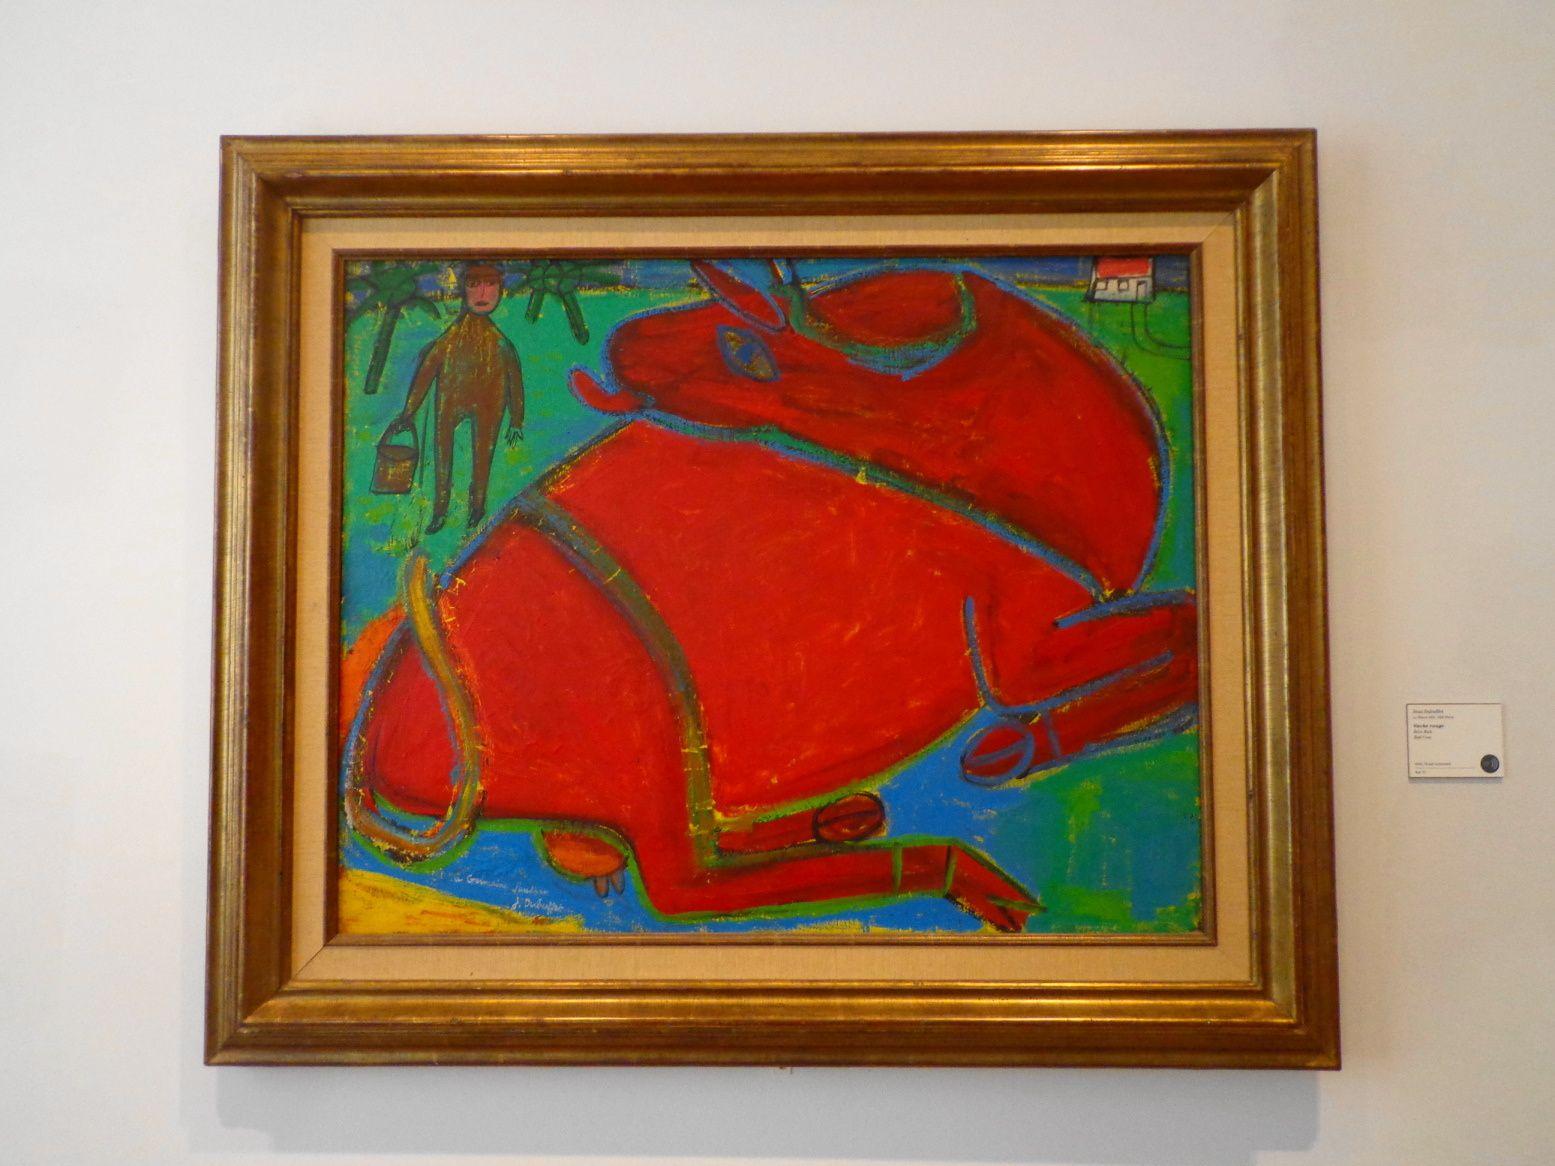 Vache rouge - Jean Dubuffet, 1943